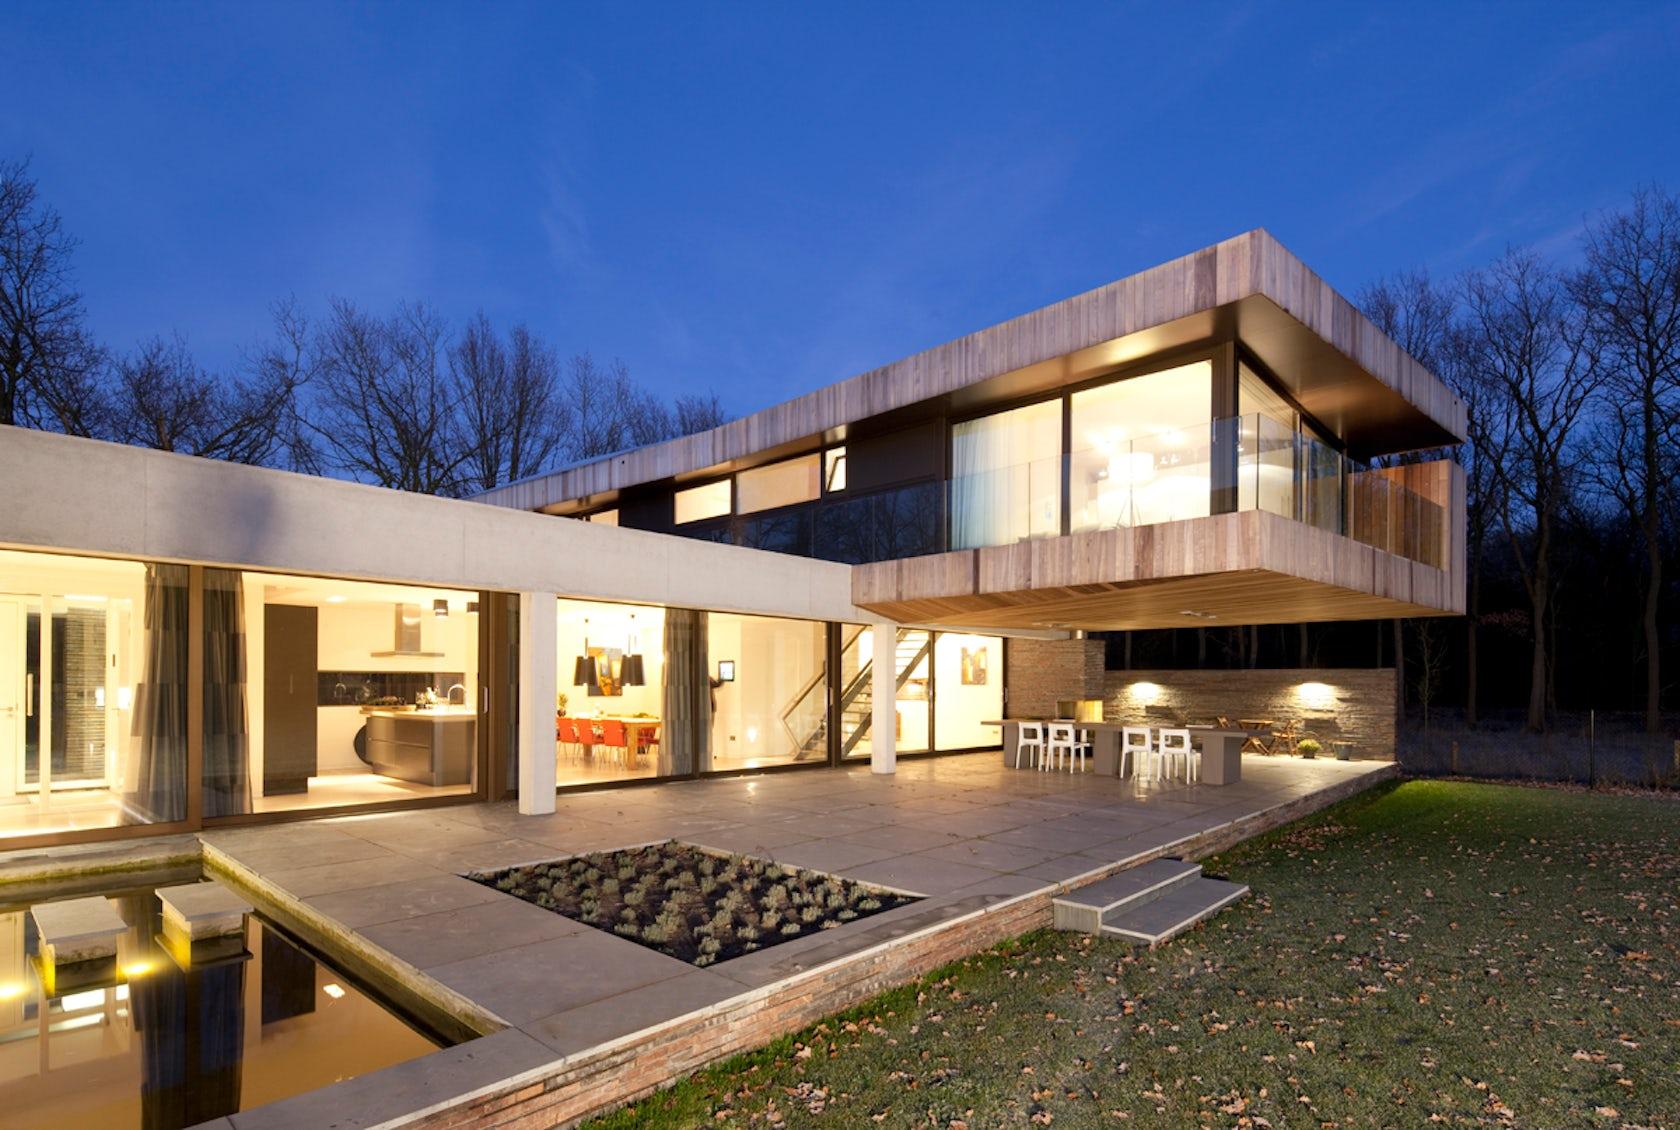 Hilberink bosch architecten architizer for Design ville moderne